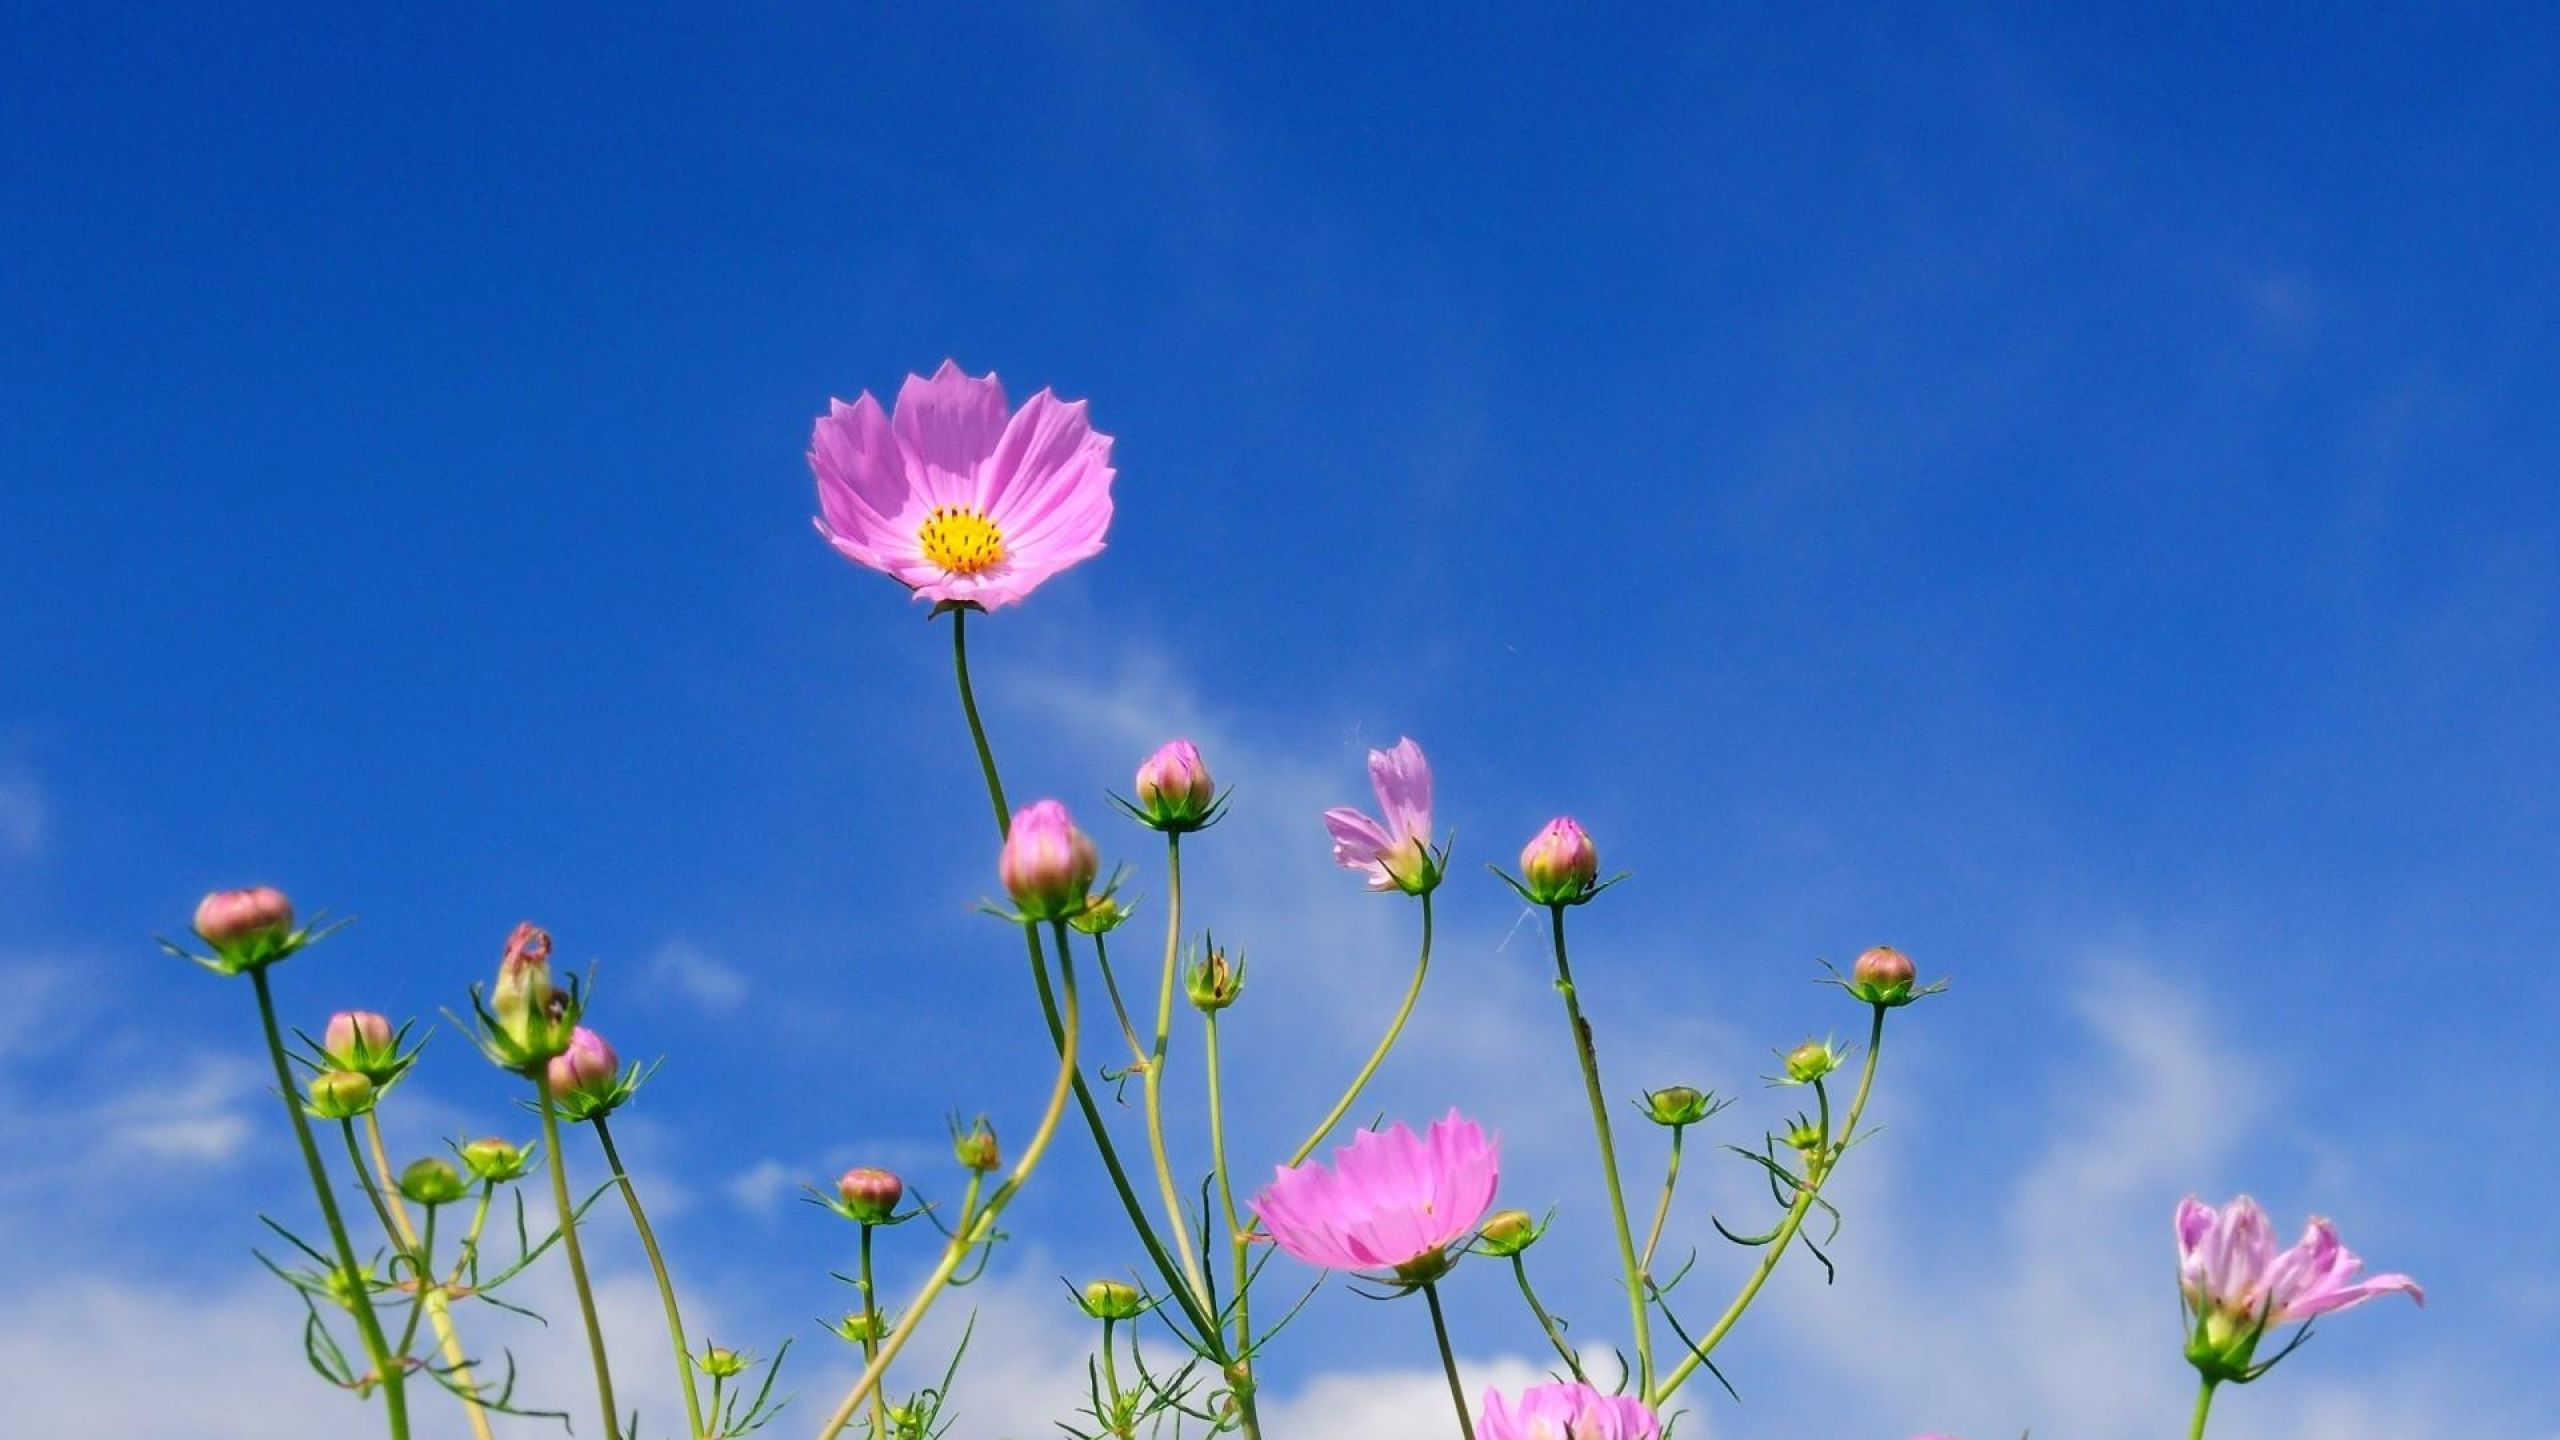 Flower wallpaper image by Sharyn Nicodemus on Flowers ...